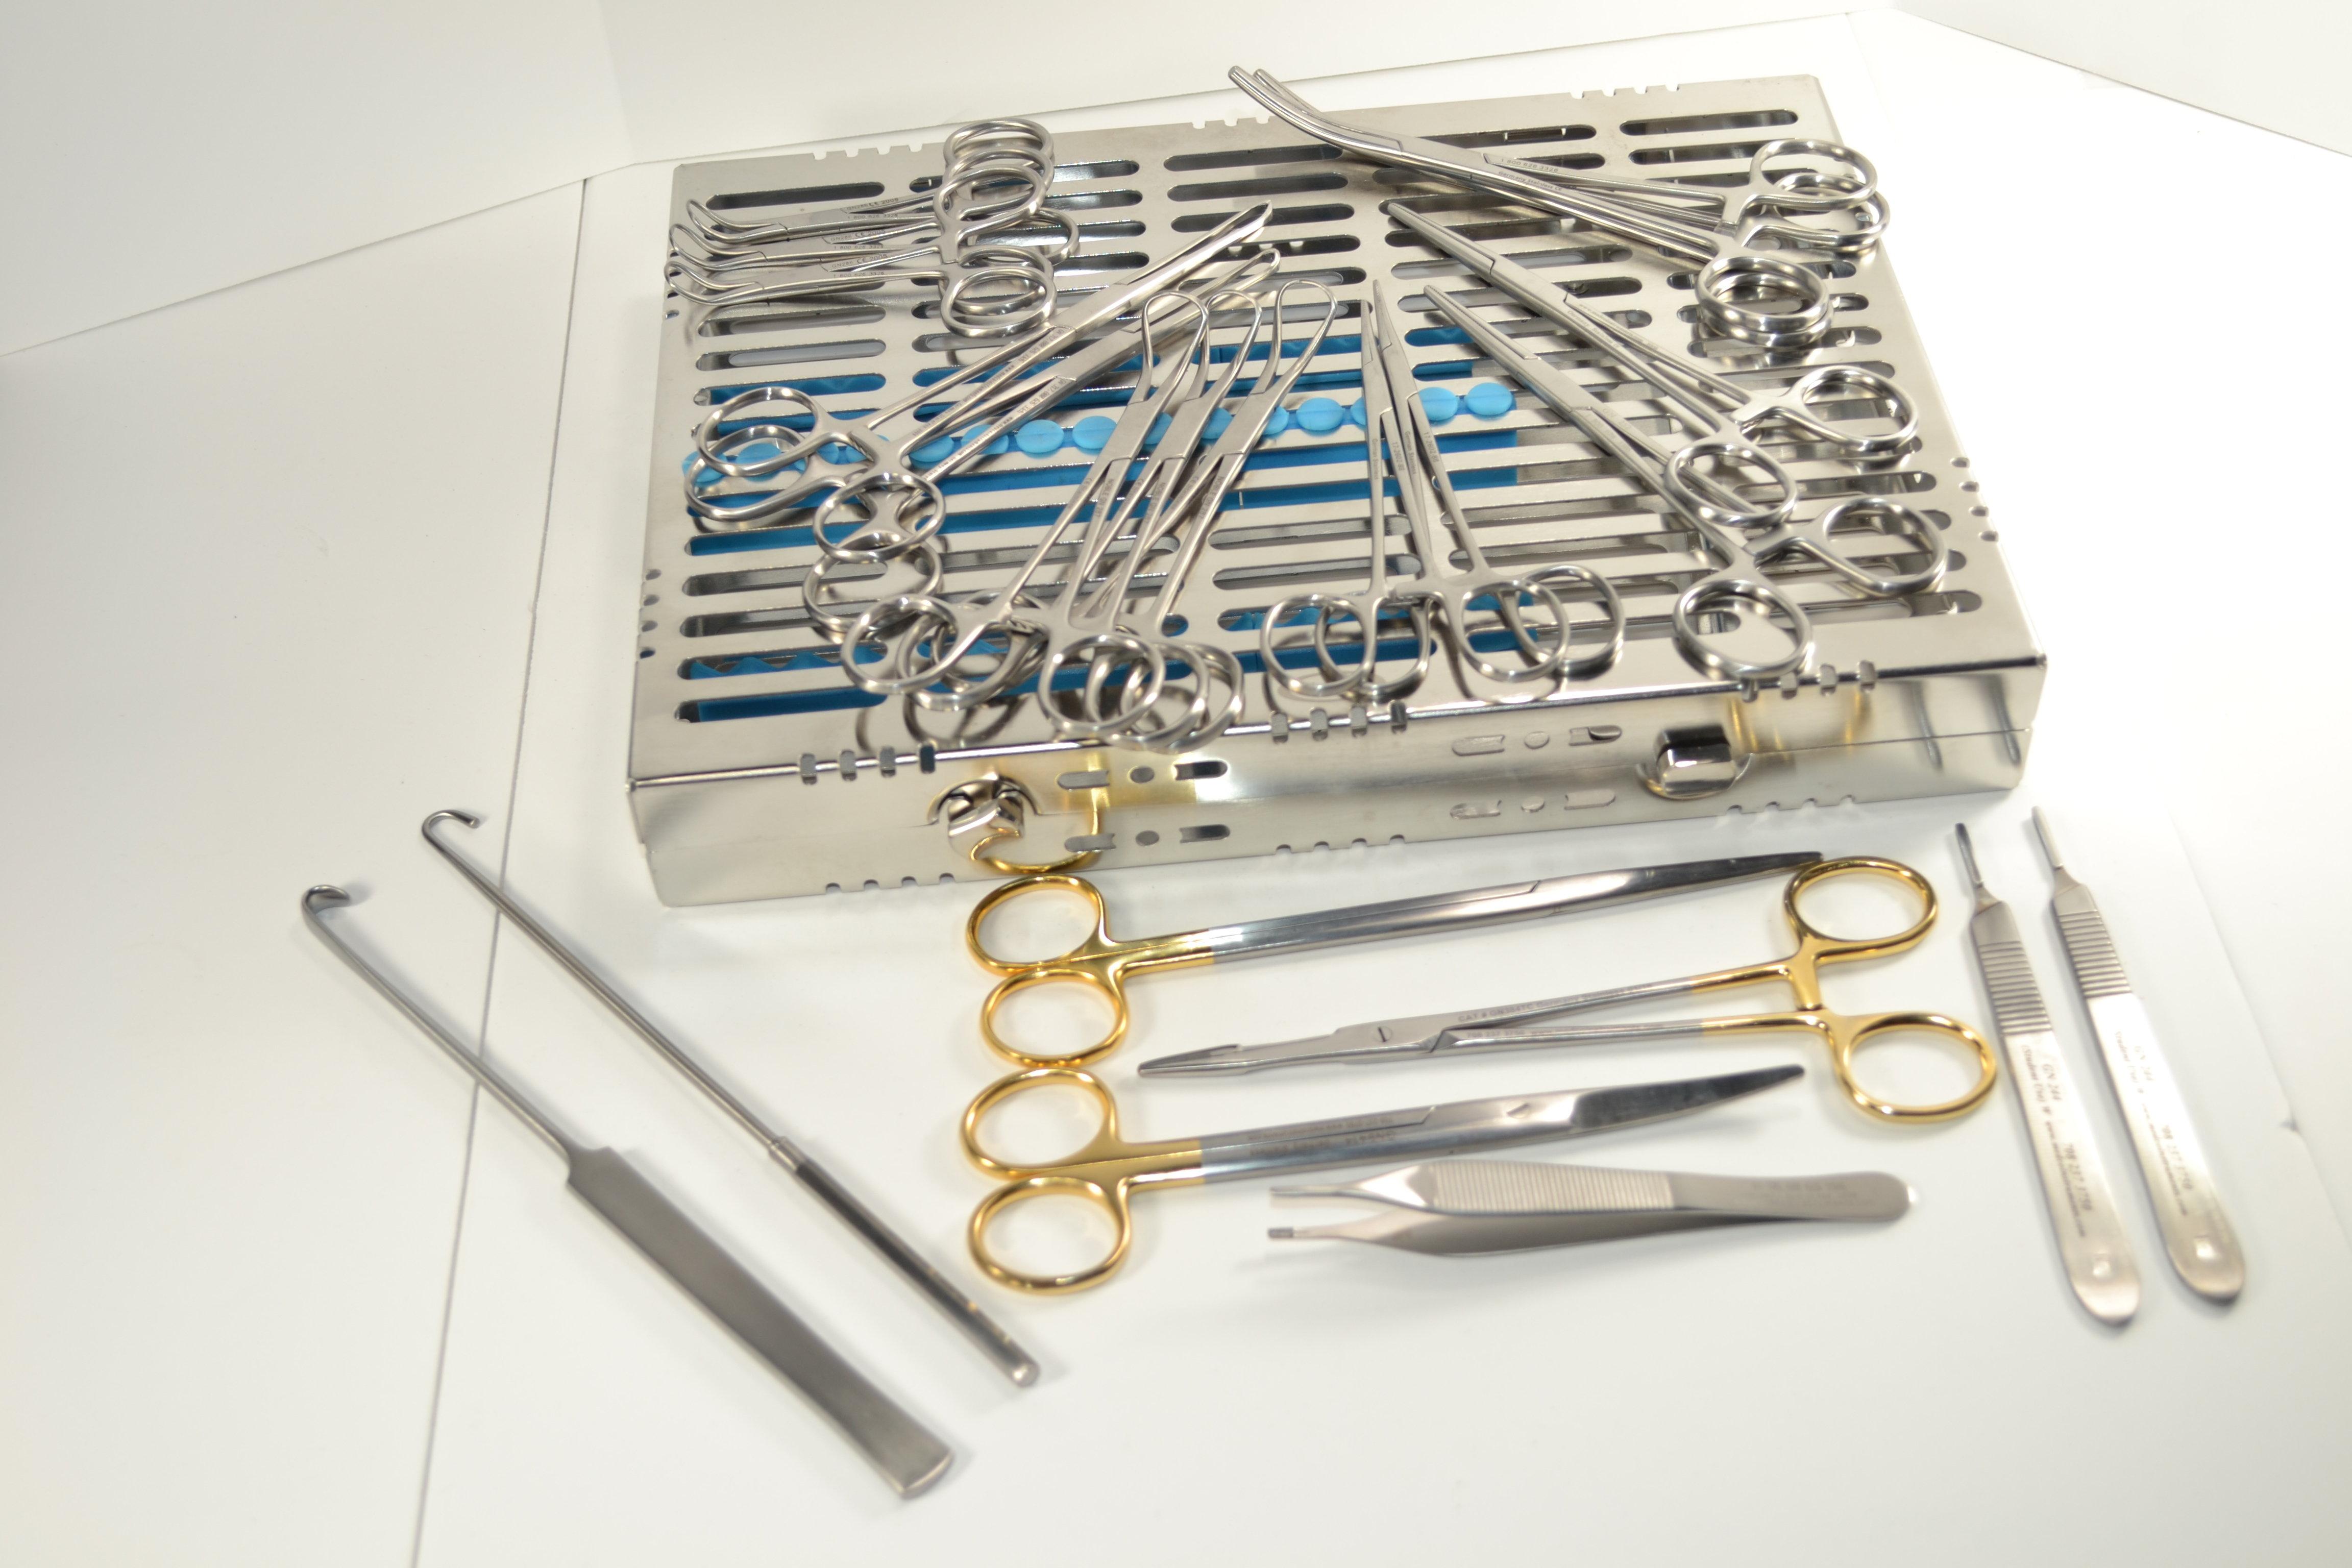 General Veterinary Surgery Kit w/ Metal Case GVS-22